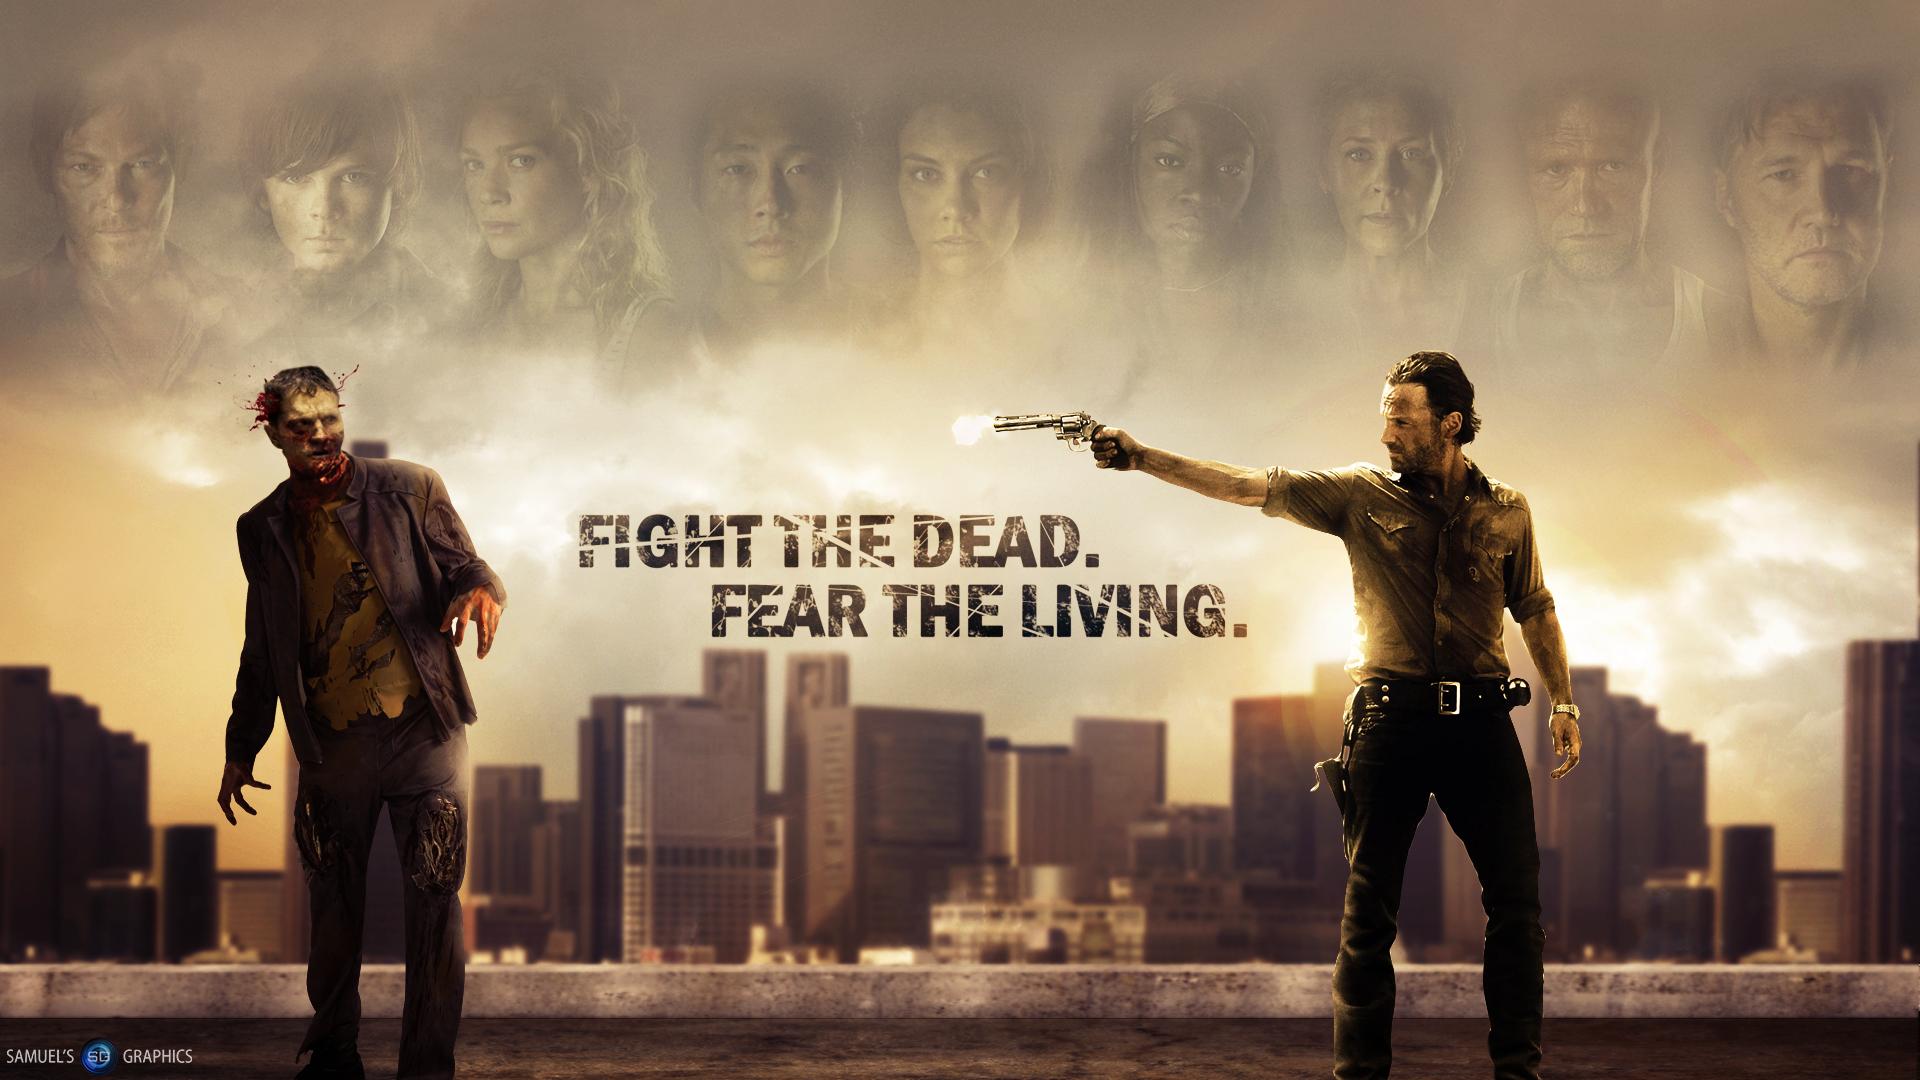 46 Walking Dead Wallpapers For Desktop On Wallpapersafari